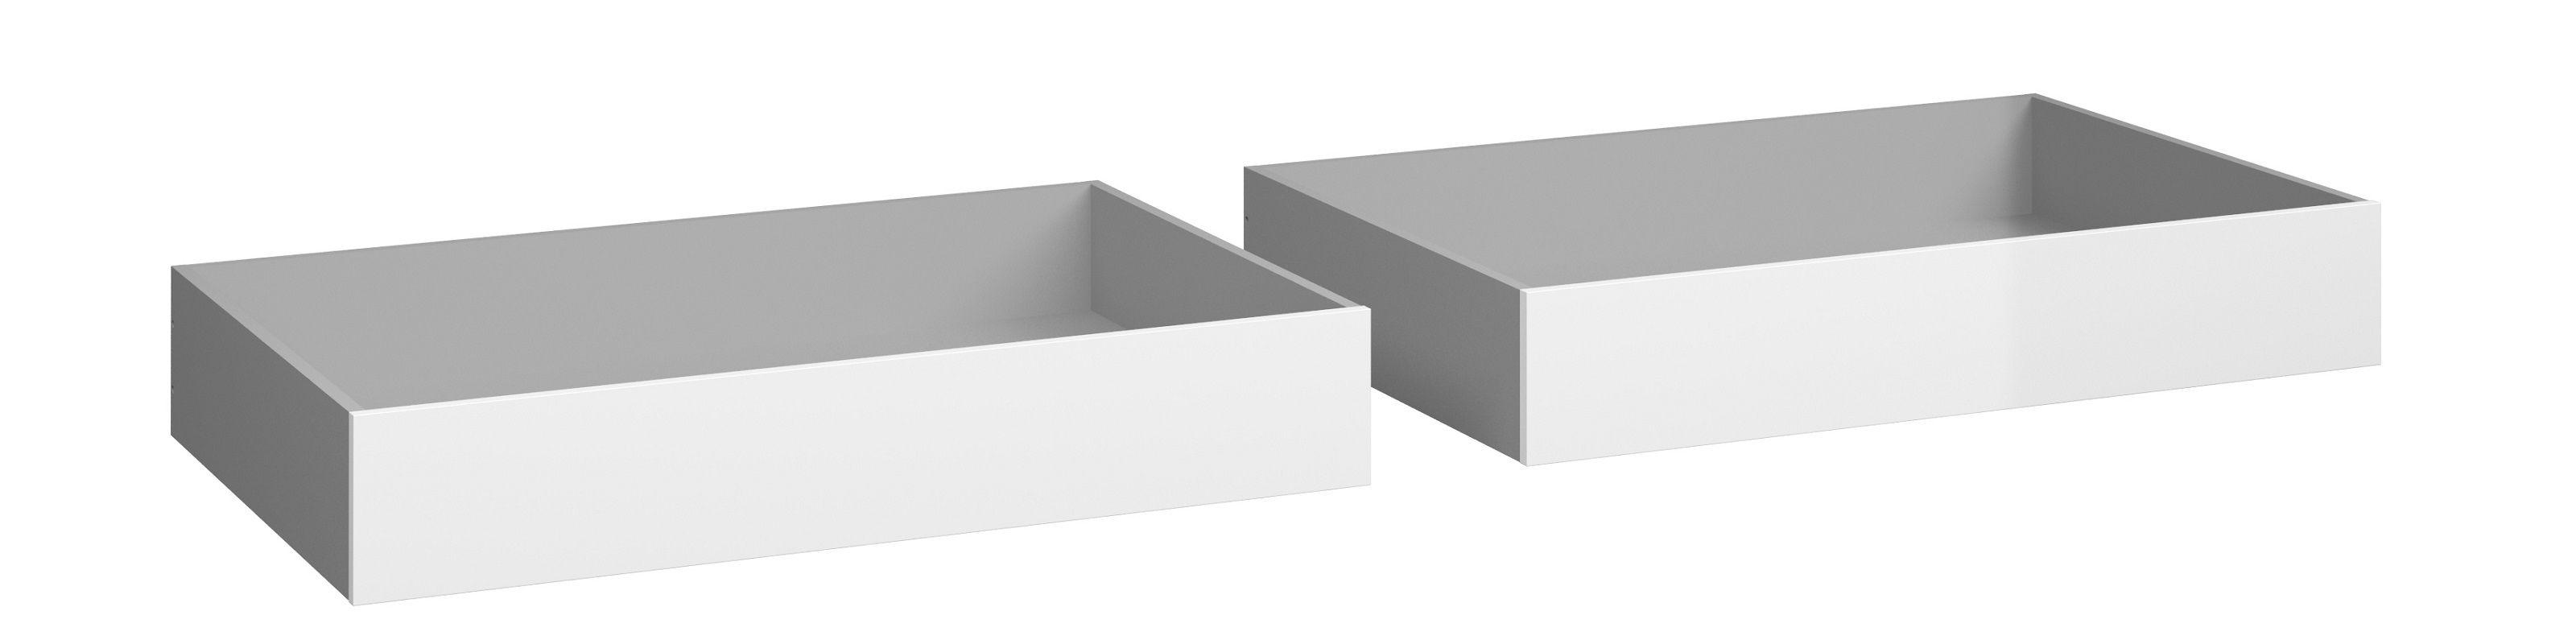 Naia Sengeskuffe - Hvid højglans B:99 - Sengeskuffer i hvid højglans